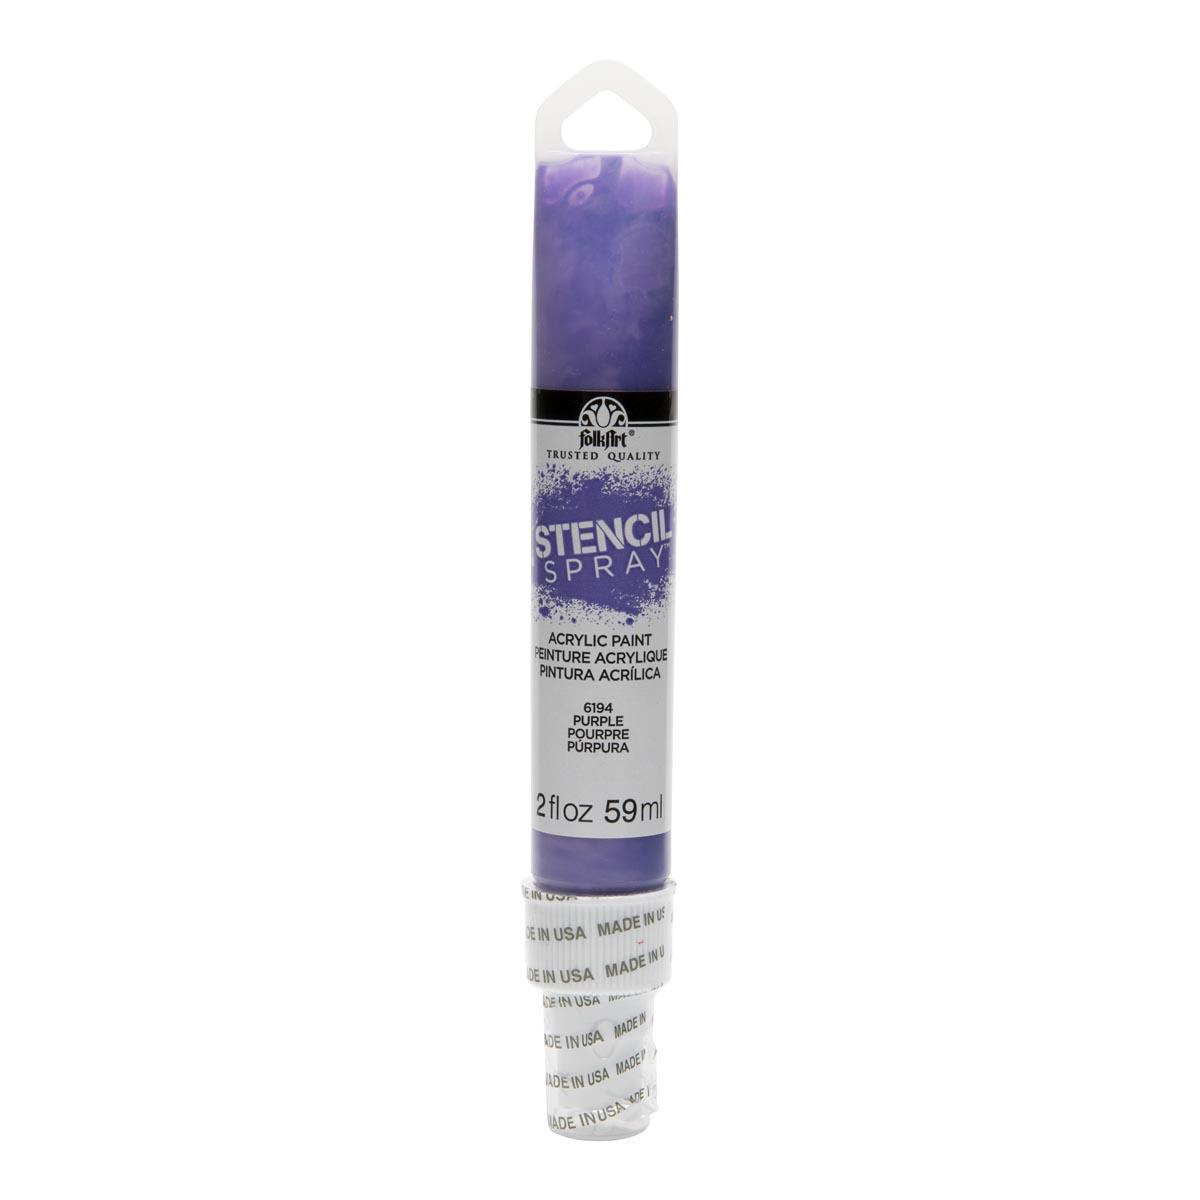 FolkArt ® Stencil Spray™ Acrylic Paint - Purple, 2 oz. - 6194